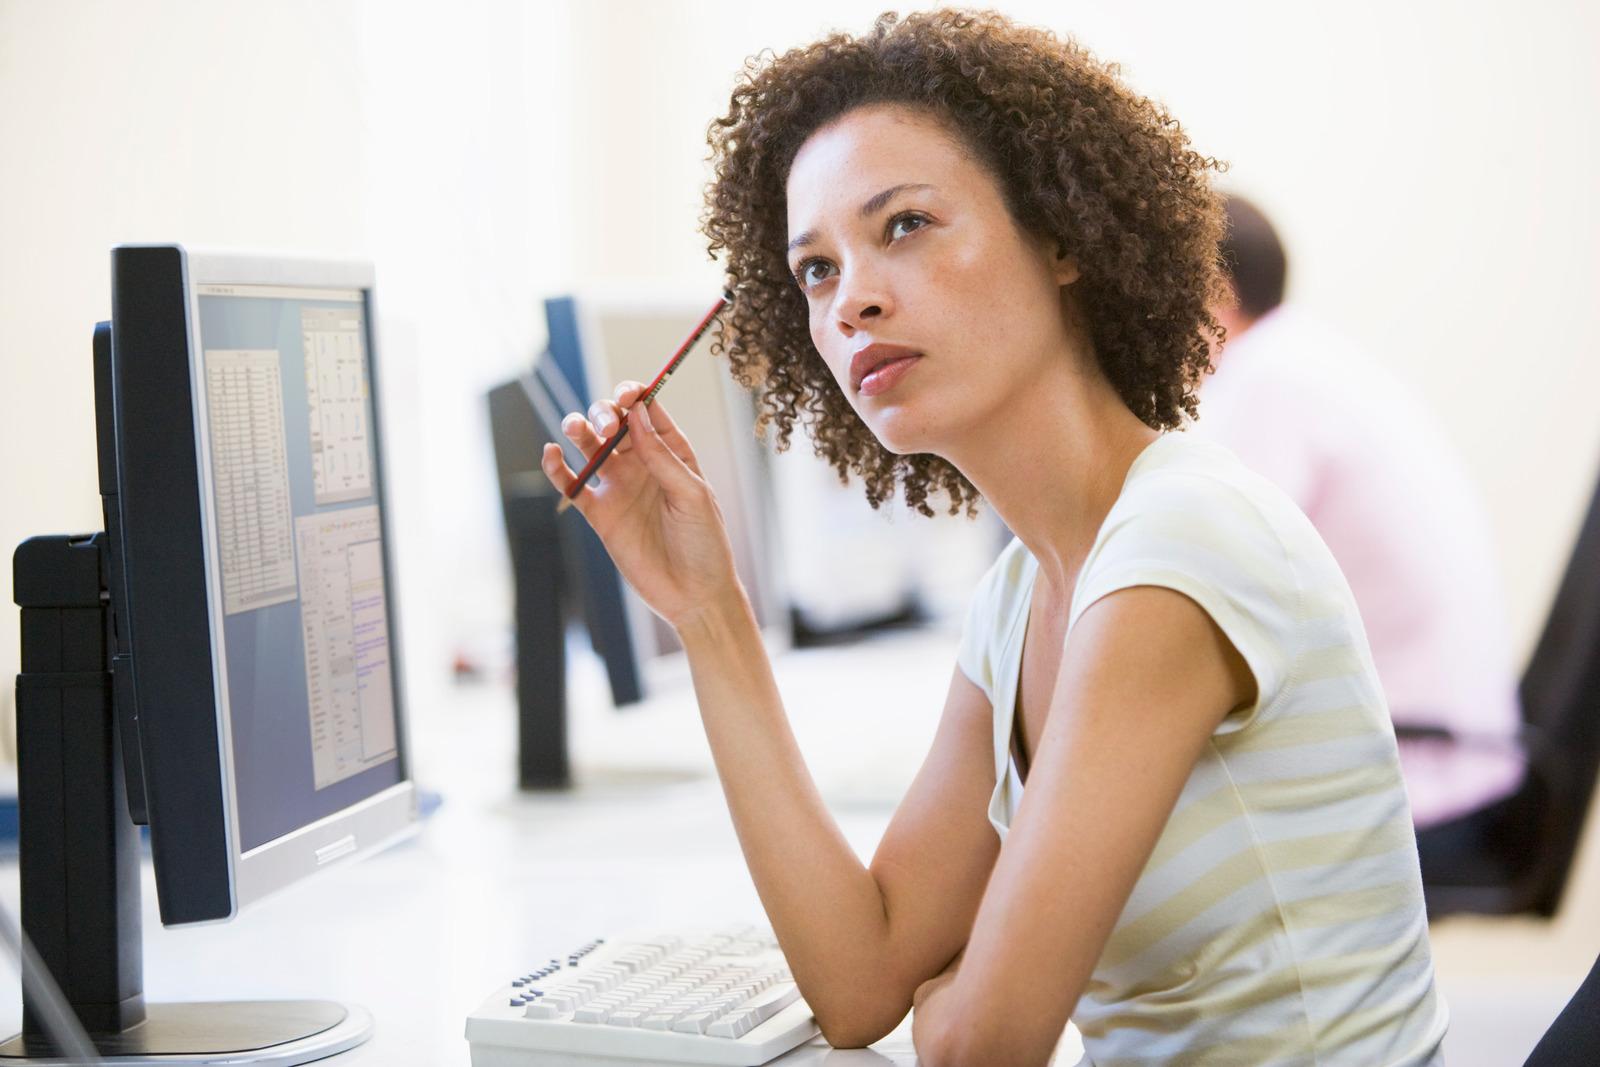 Woman in computer room thinking | OWLLytics